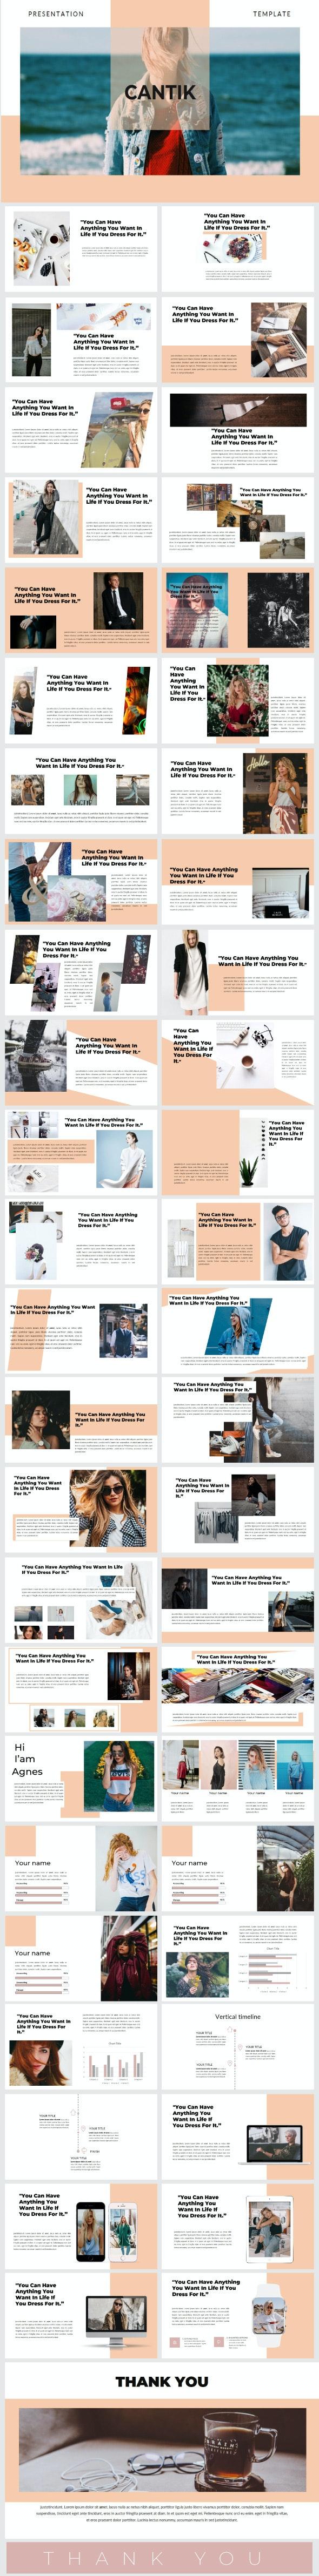 cantik powerpoint - Creative PowerPoint Templates